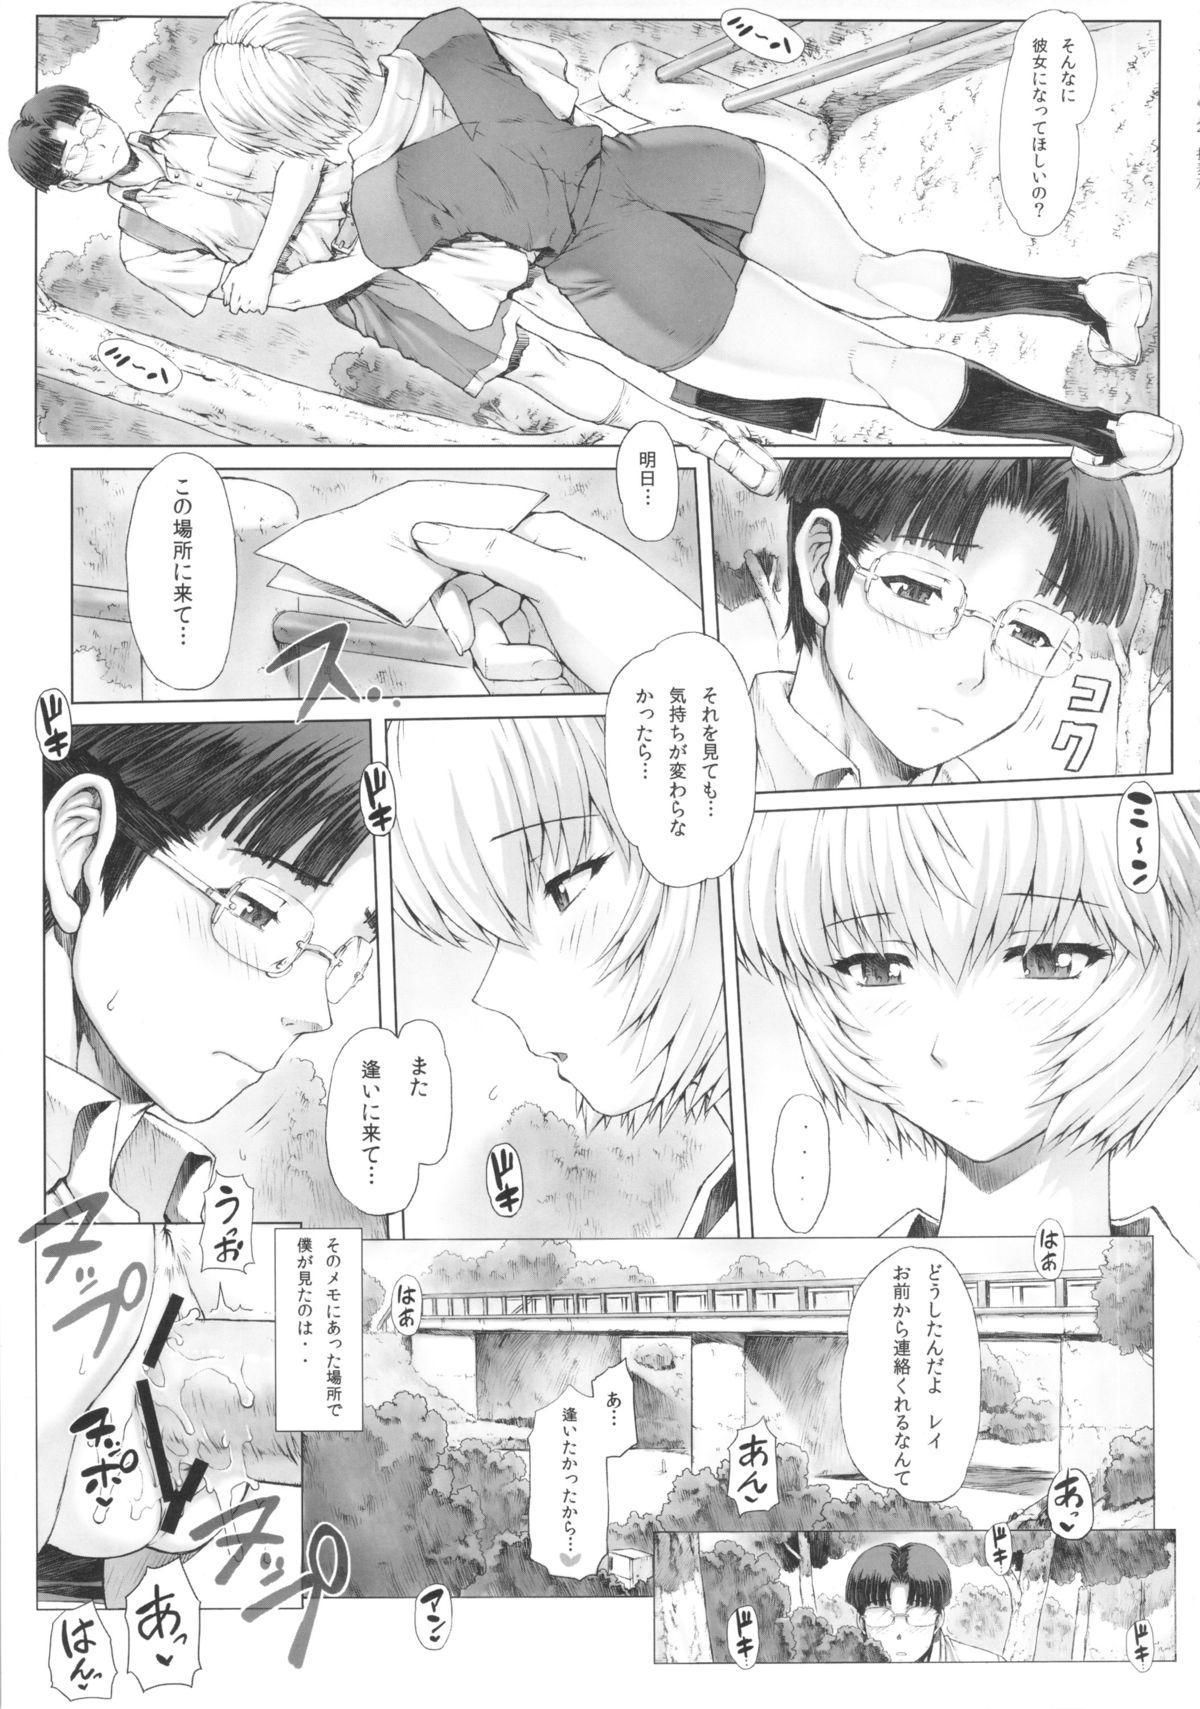 Ayanami Dai 4 Kai + Omake Bon + Postcard 6